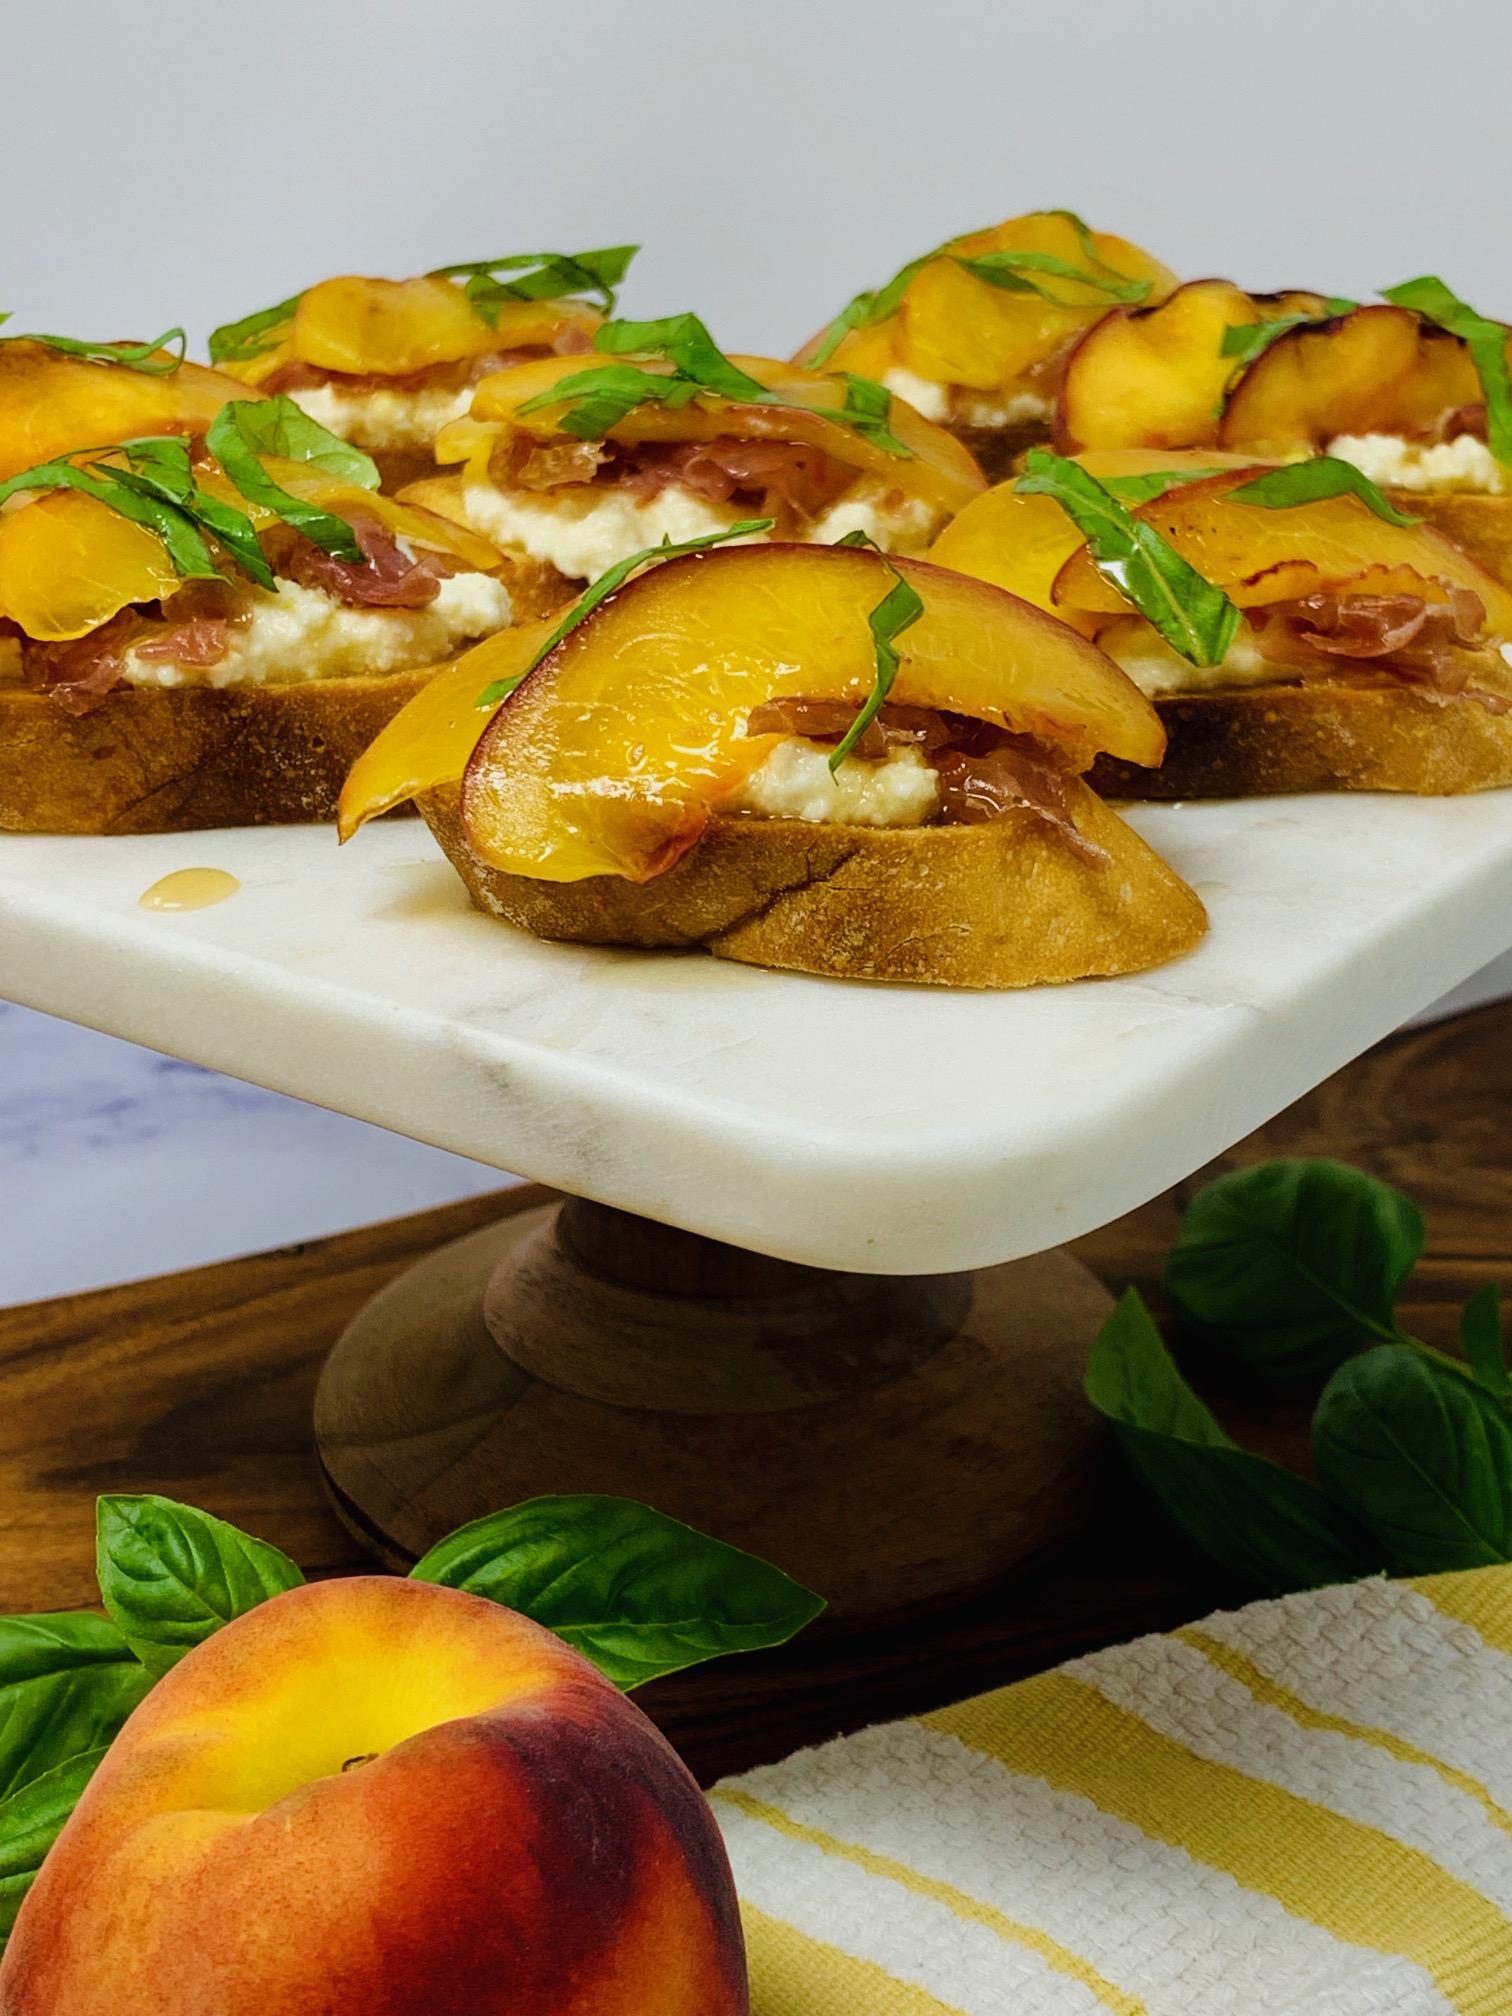 Grilled Peach and Ricotta Crostini